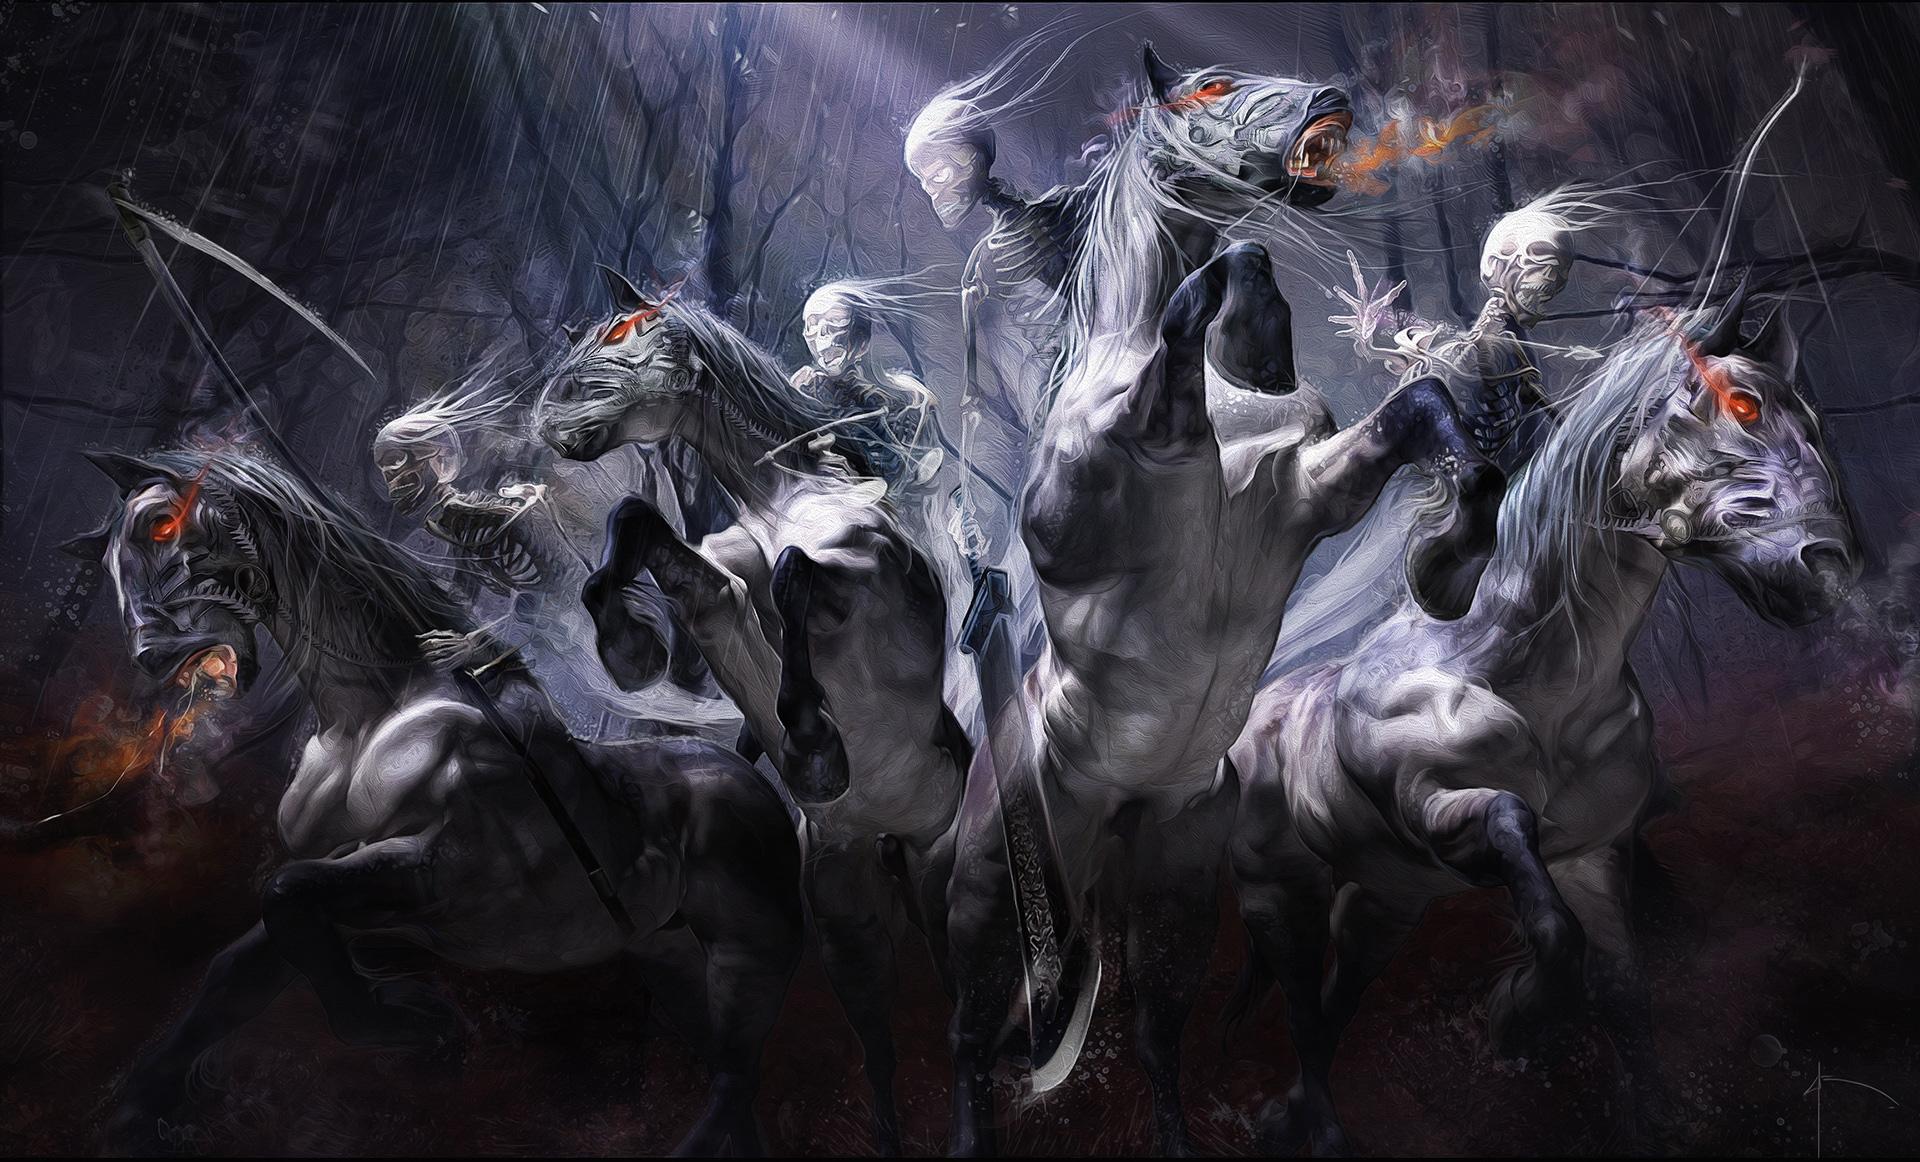 illustration by Yayashin - Dark fantasy - four horsemen